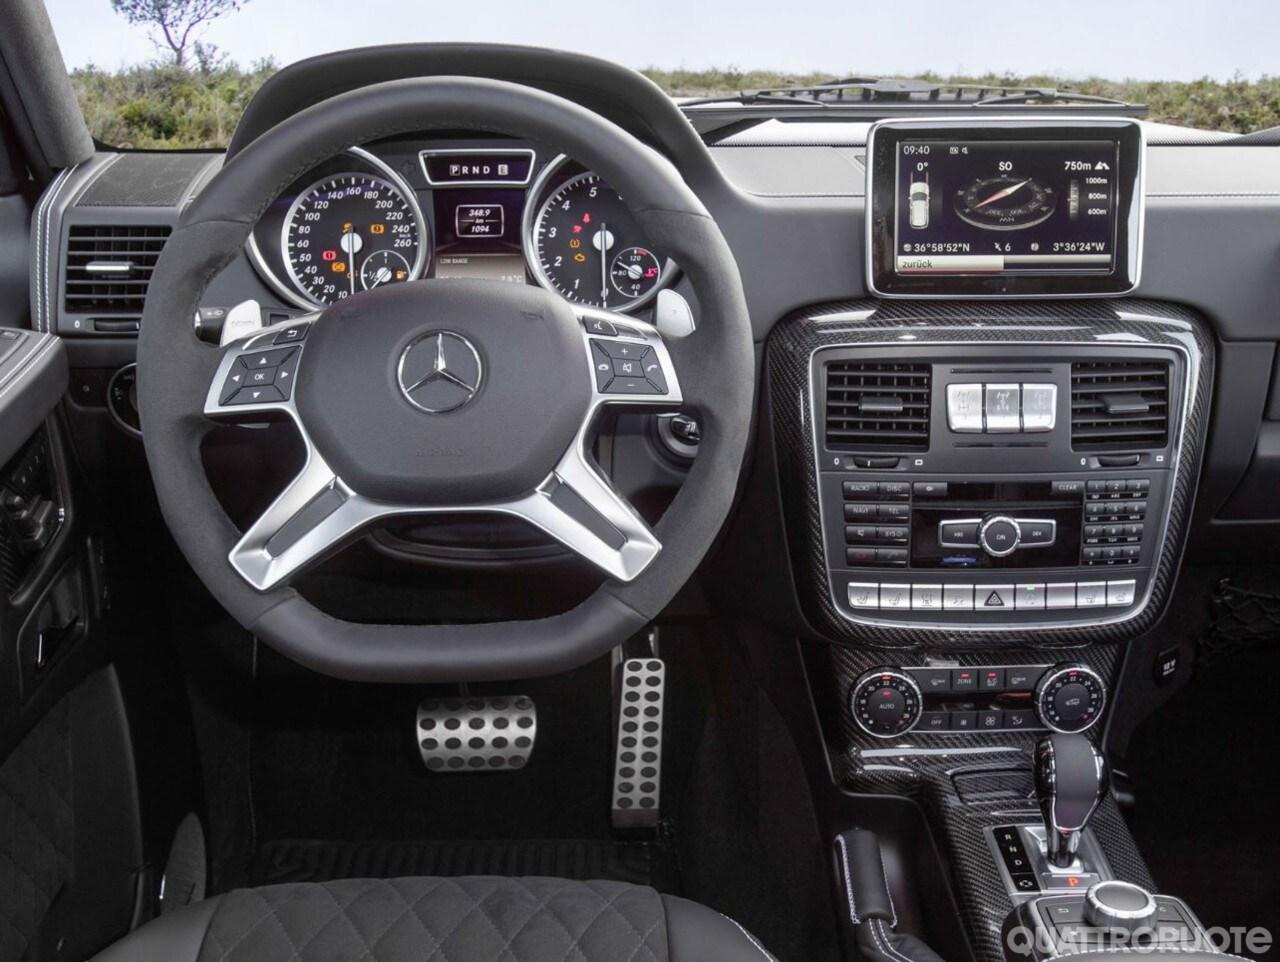 Mercedes benz g550 4x4 usa 2016 foto e immagini for Mercedes benz usa website